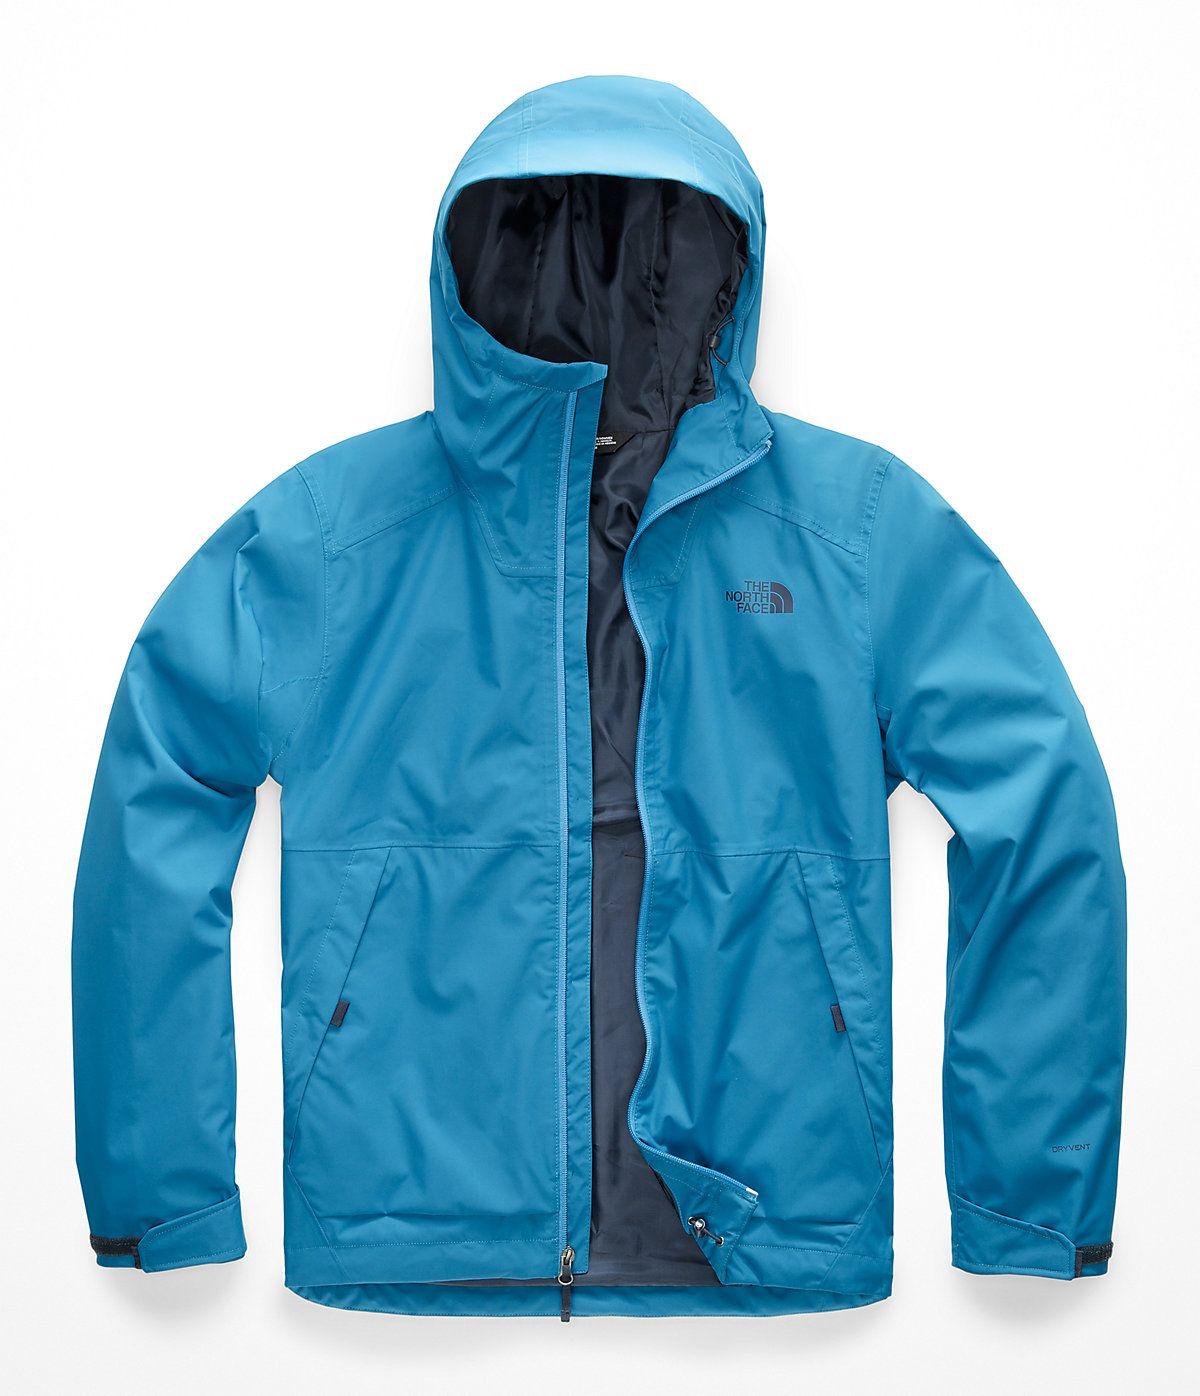 Men S Millerton Jacket Free Shipping The North Face North Face Mens Breathable Jacket Jackets [ 1396 x 1200 Pixel ]